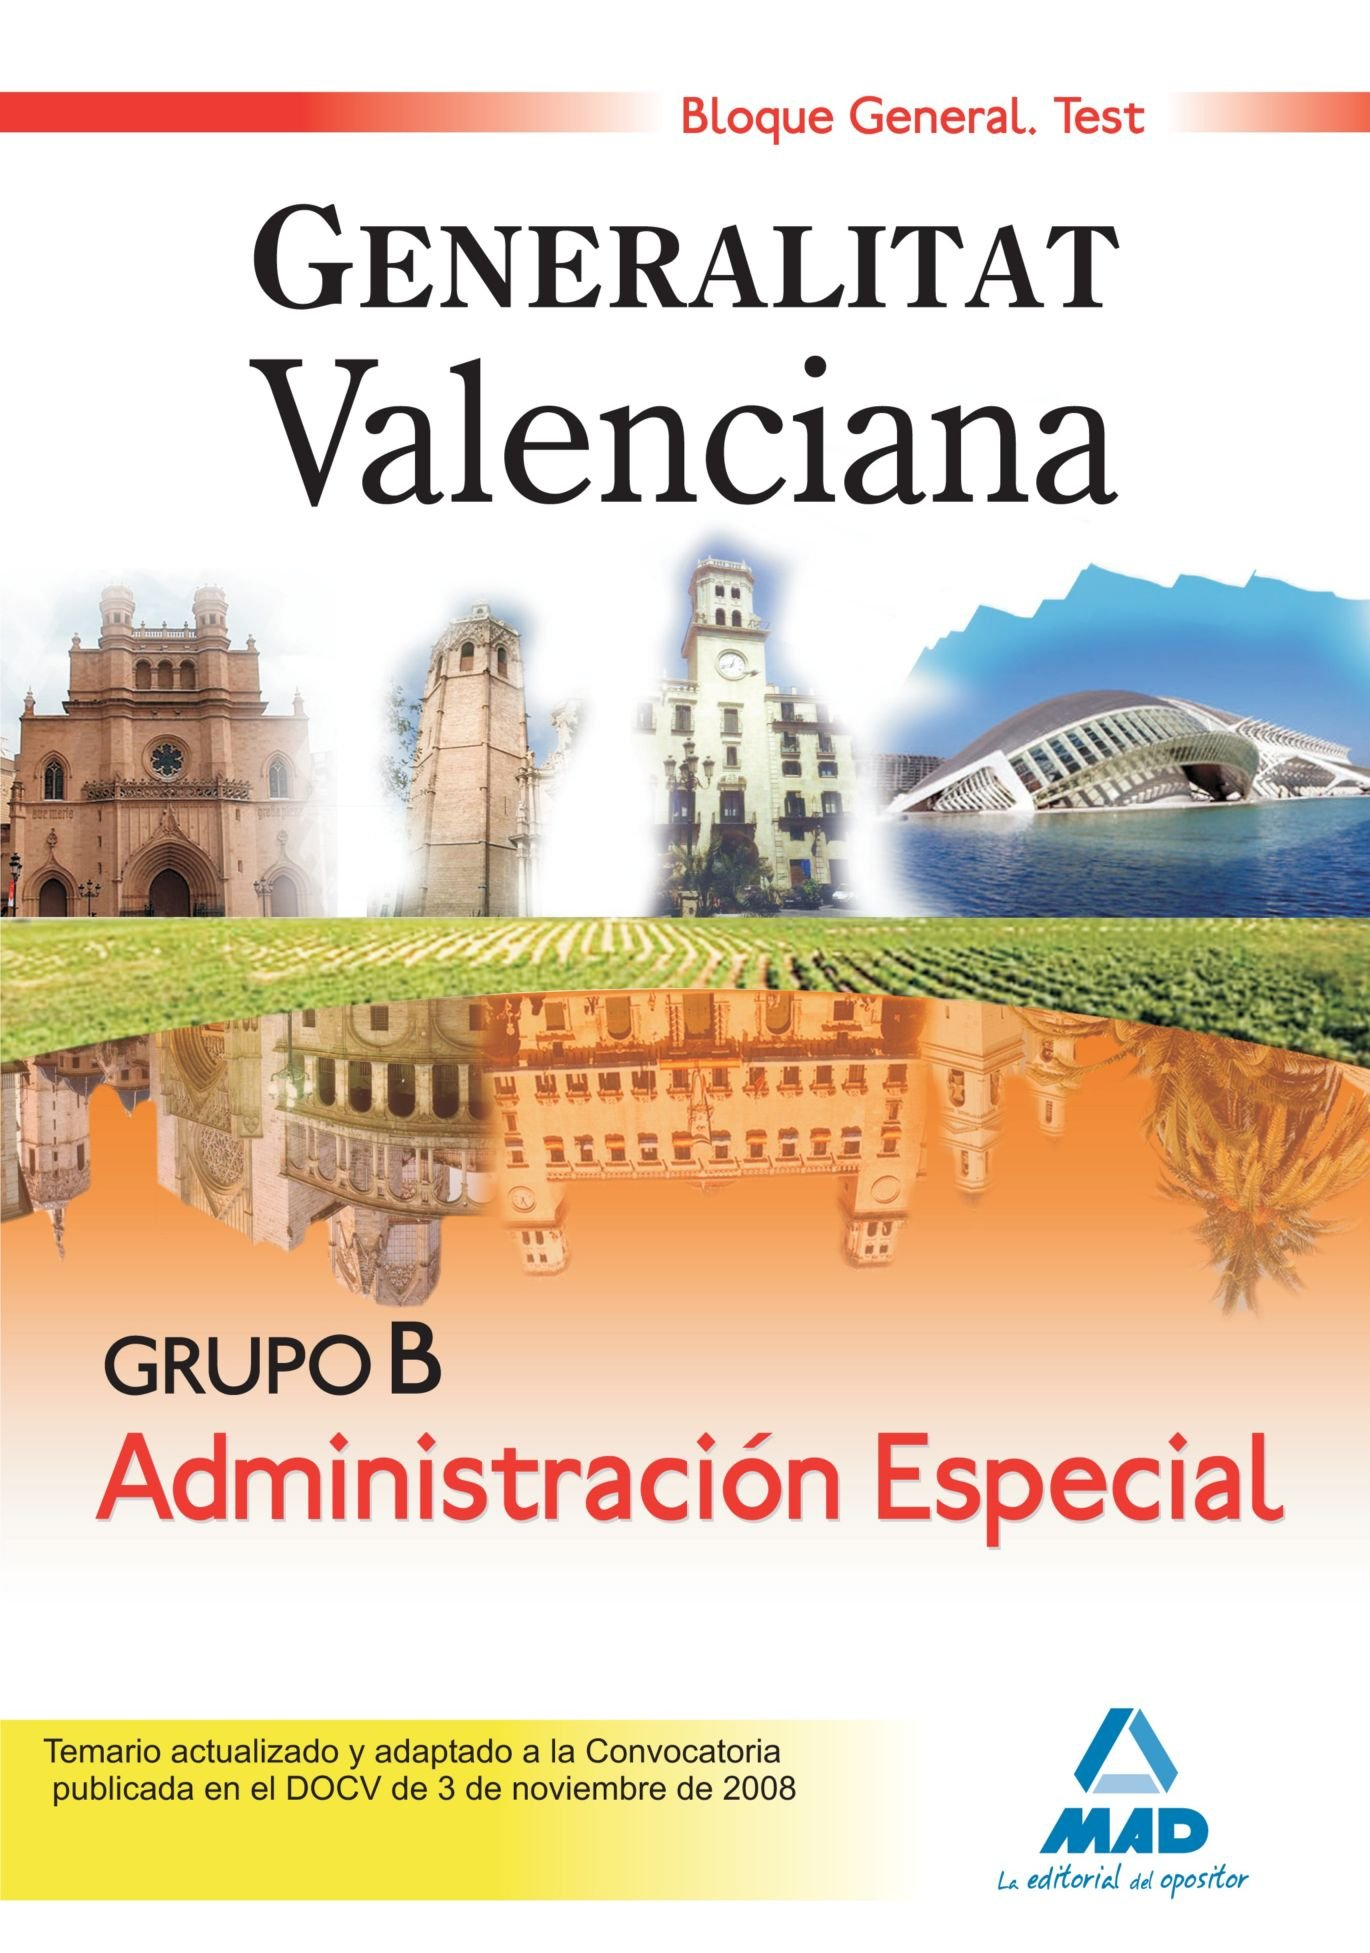 Grupo B Administración Especial Bloque General. Generalitat Valenciana. Test (Spanish Edition) PDF